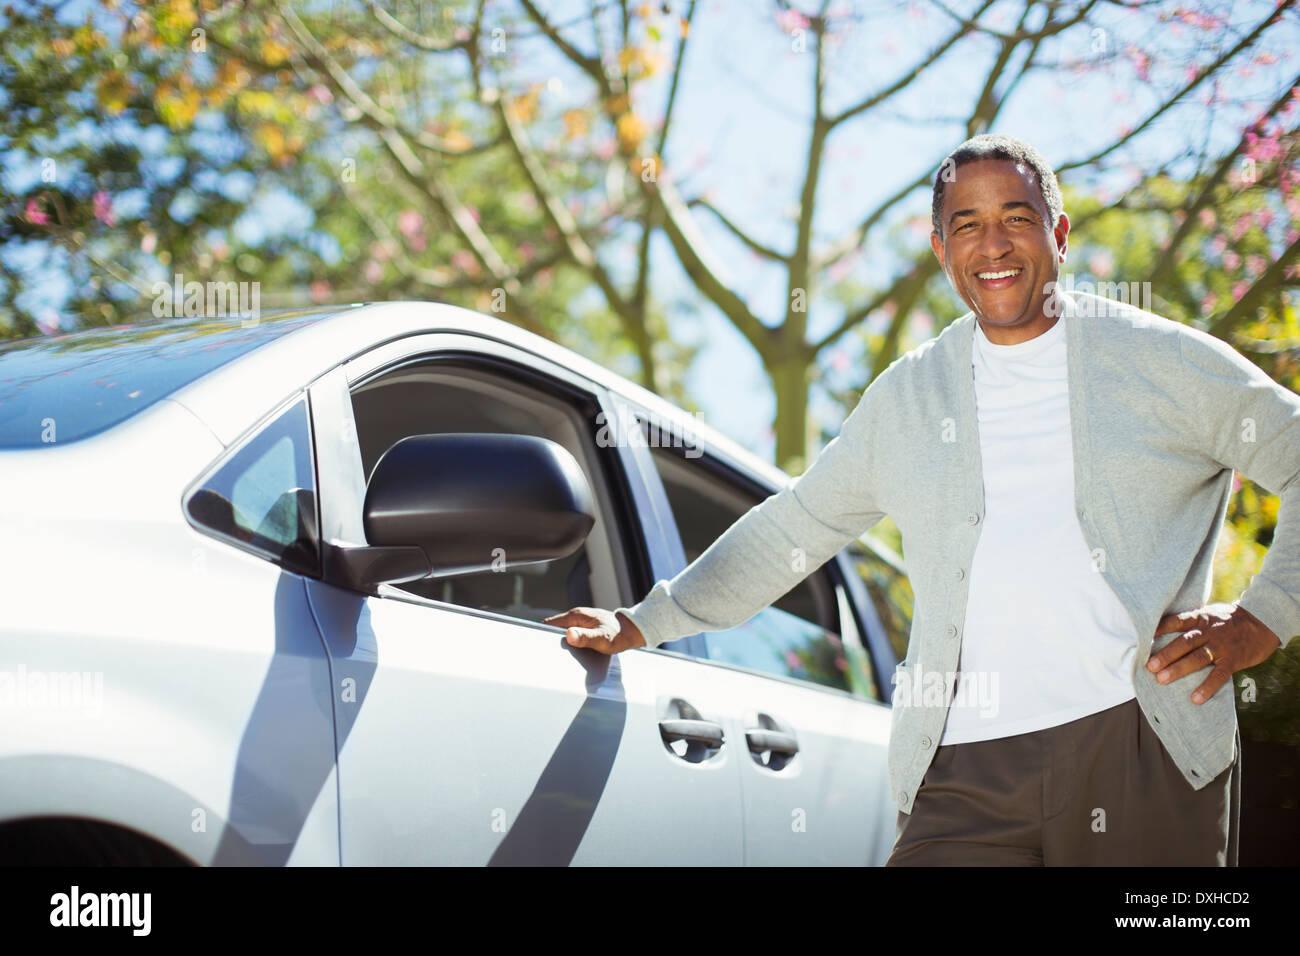 Portrait of confident senior man leaning against car - Stock Image